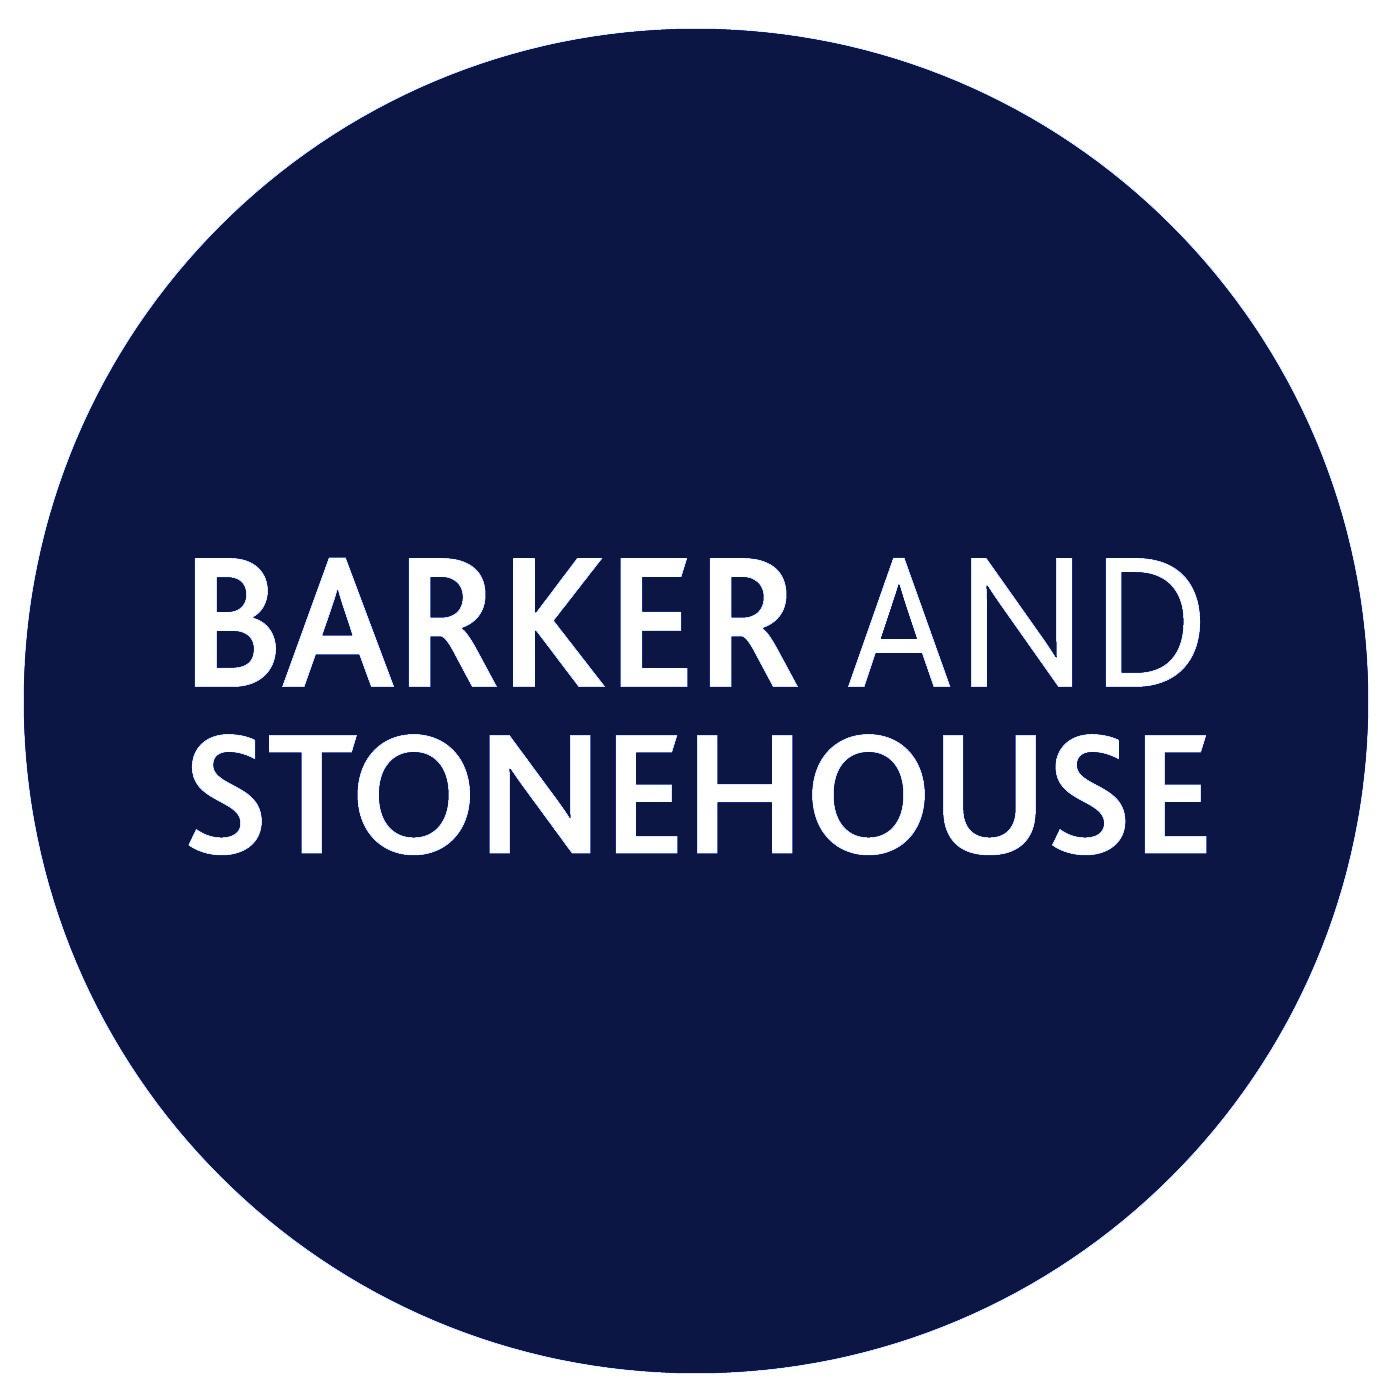 Barker & Stonehouse Mystery Shopping Case Study